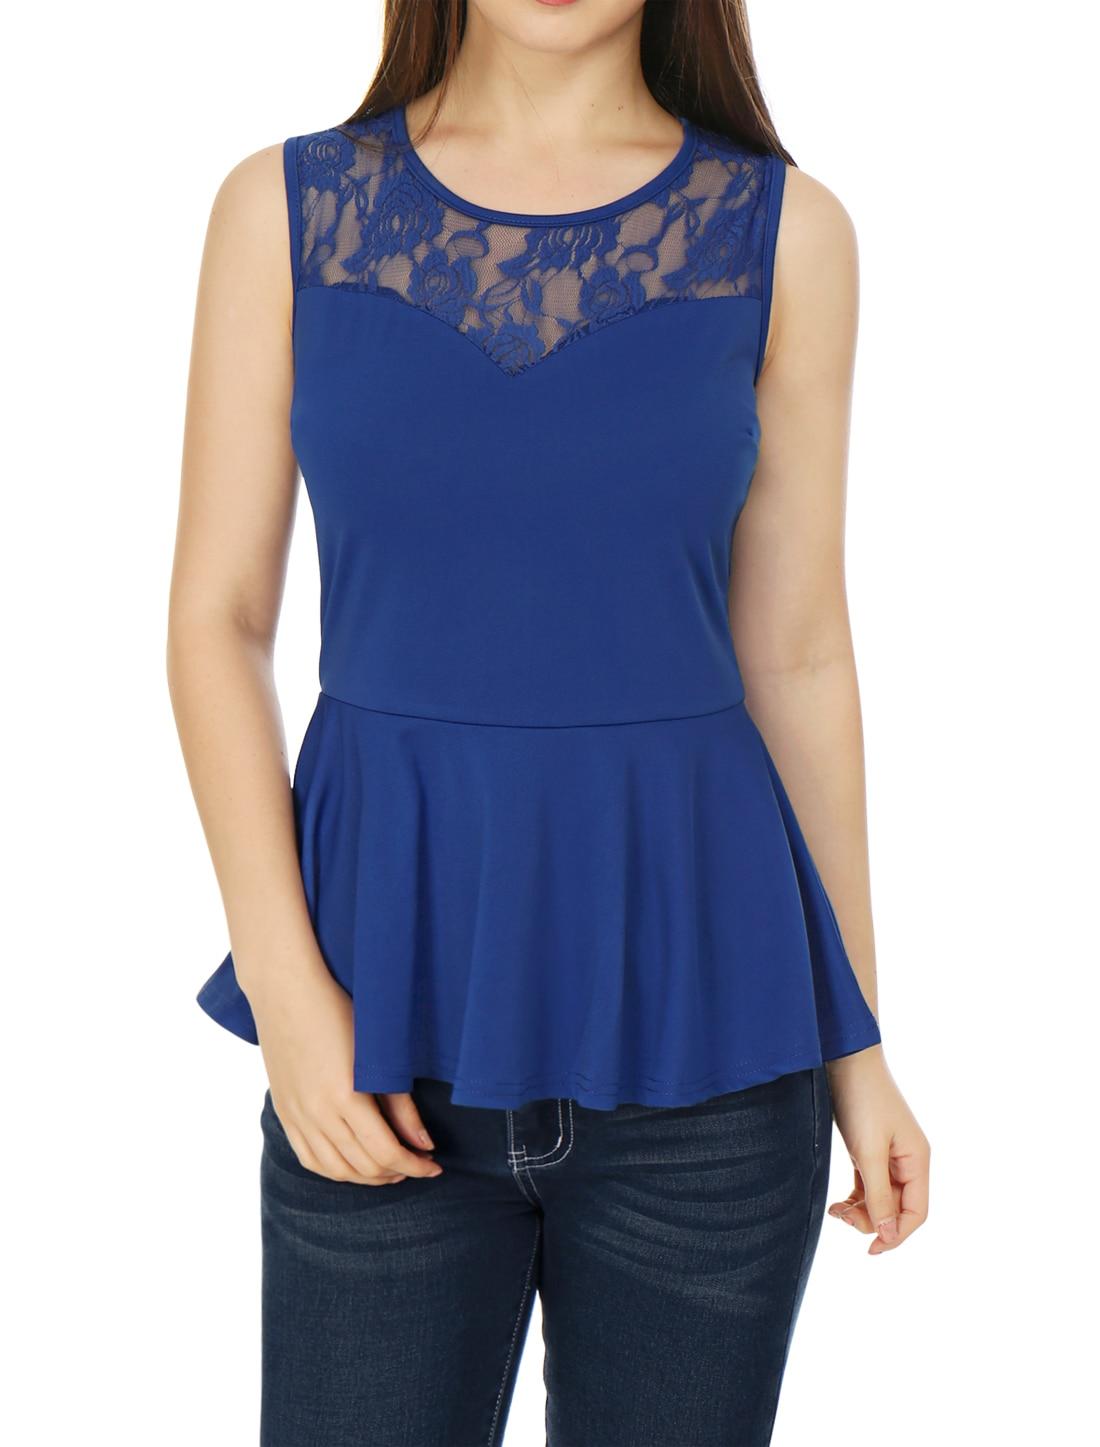 Allegra K Ladies Cap Sleeves Round Neck Stripes Peplum Top Blue M